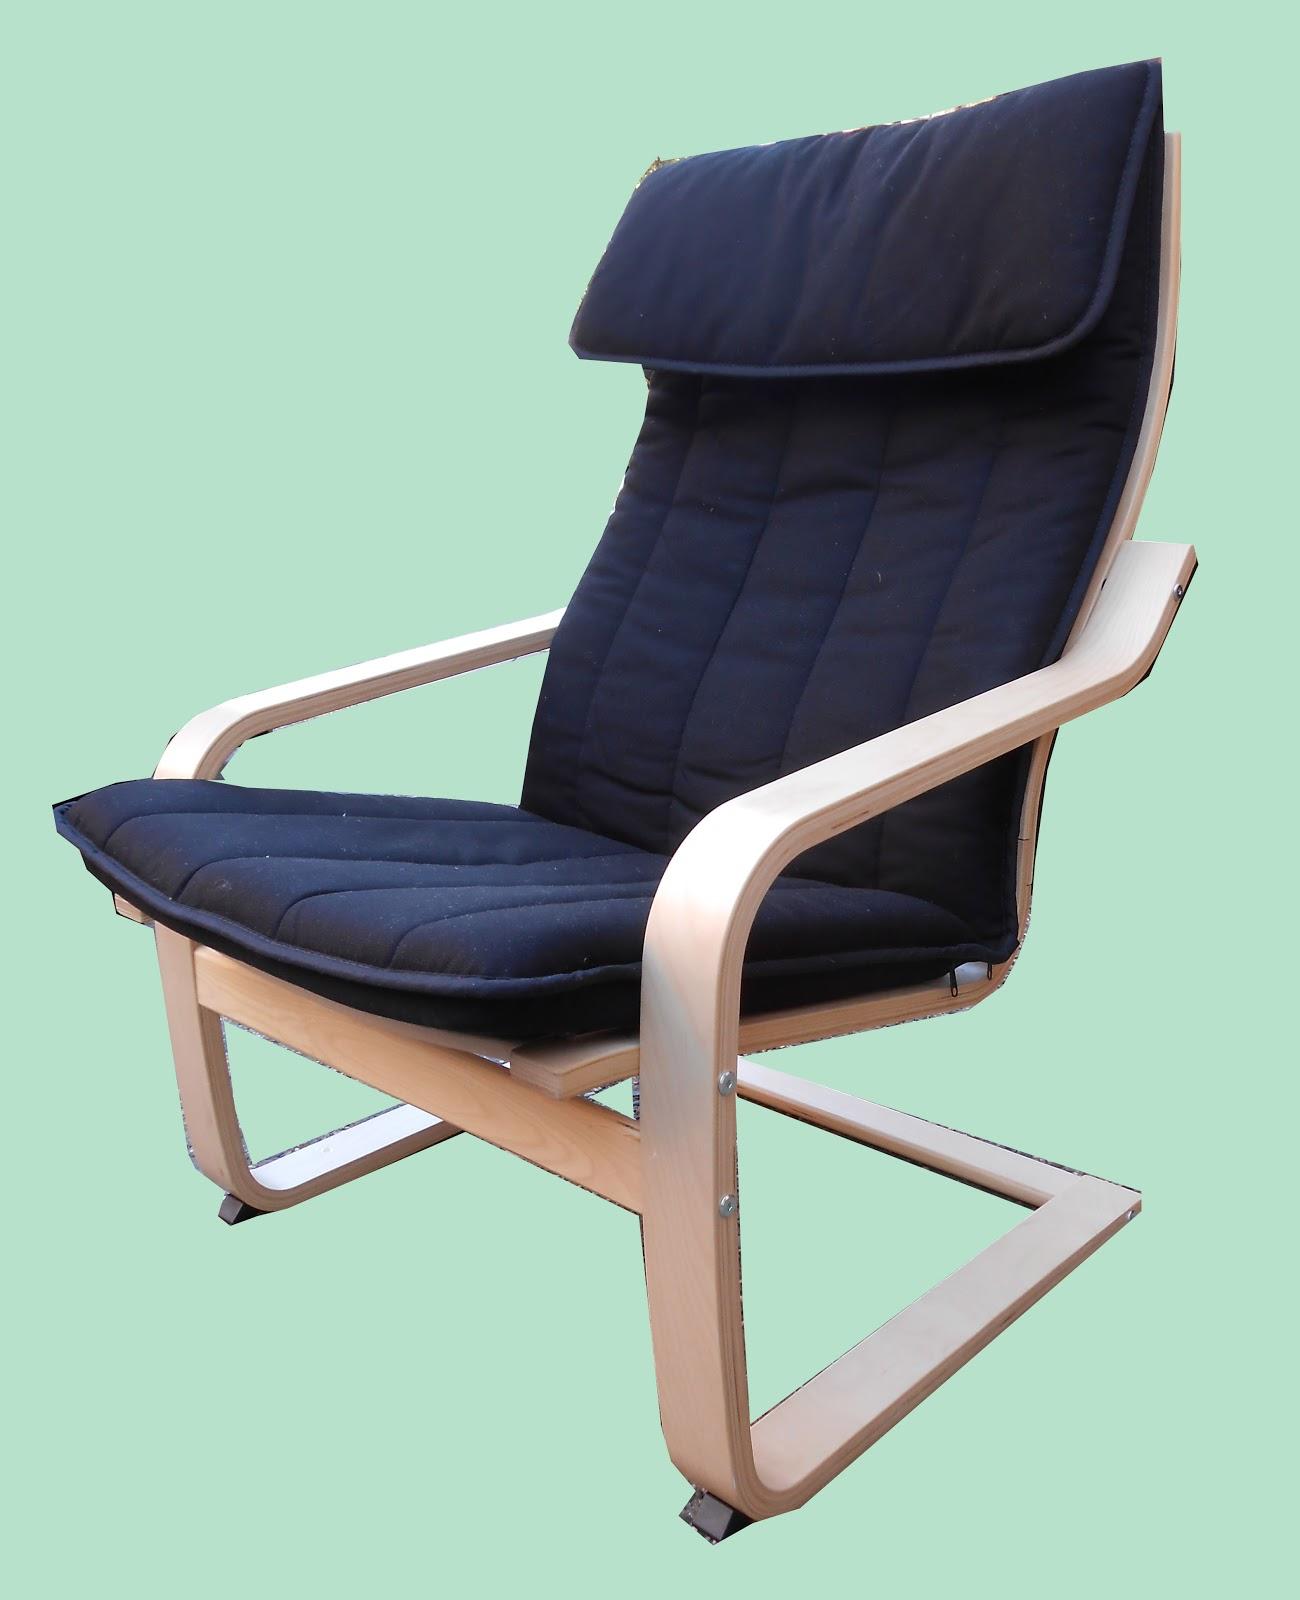 Uhuru Furniture Collectibles Ikea Poang Lounge Chair Sold